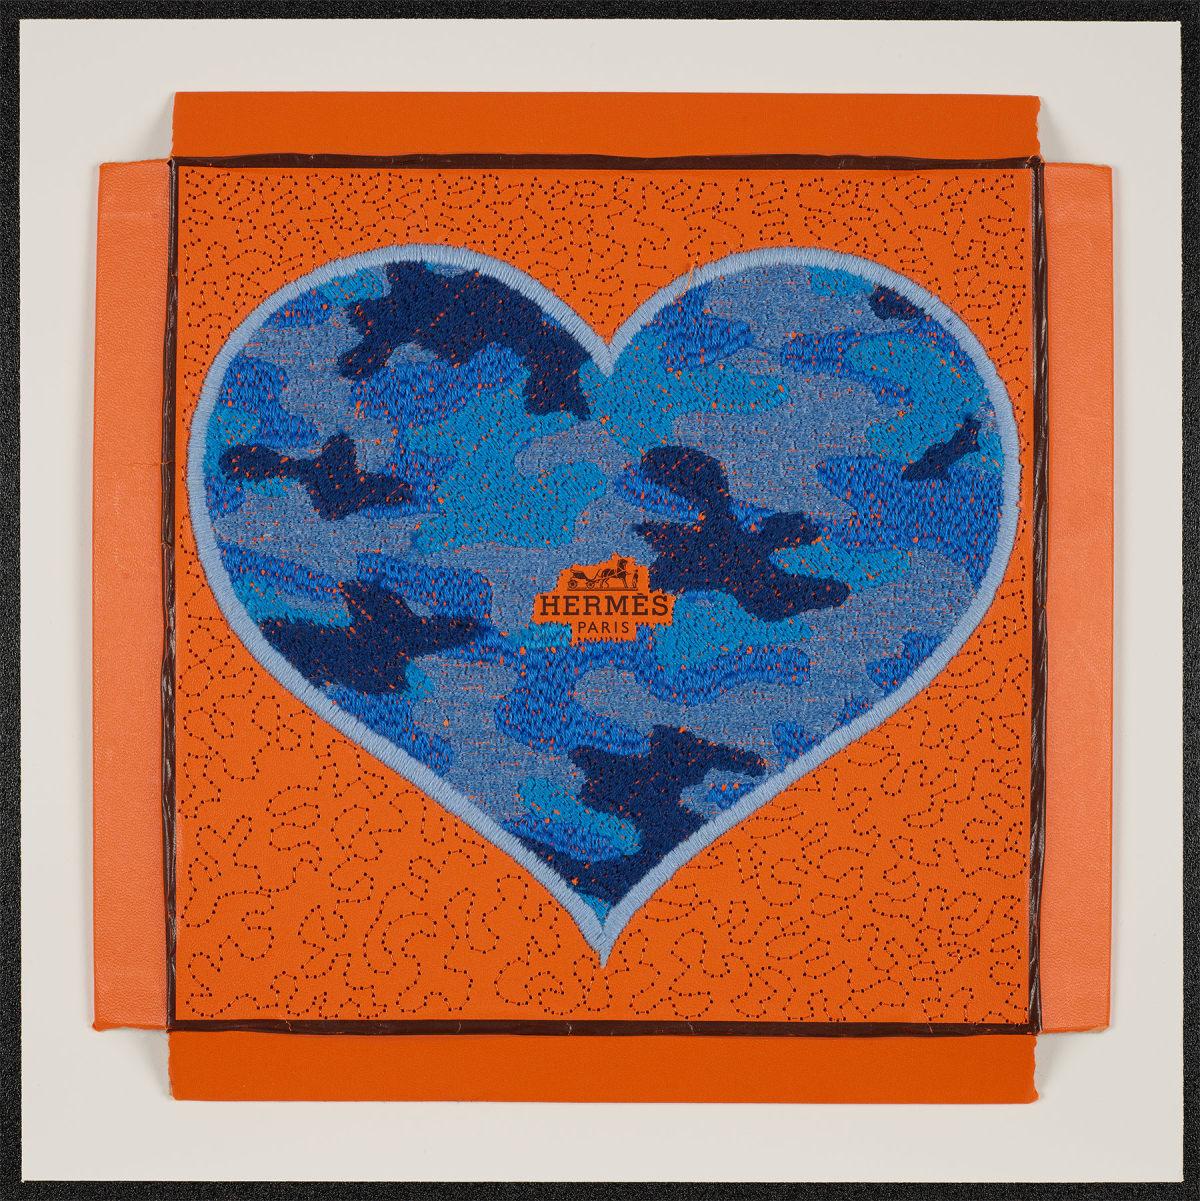 Stephen Wilson, Hermes Camo Heart (Flat Blue), 2020